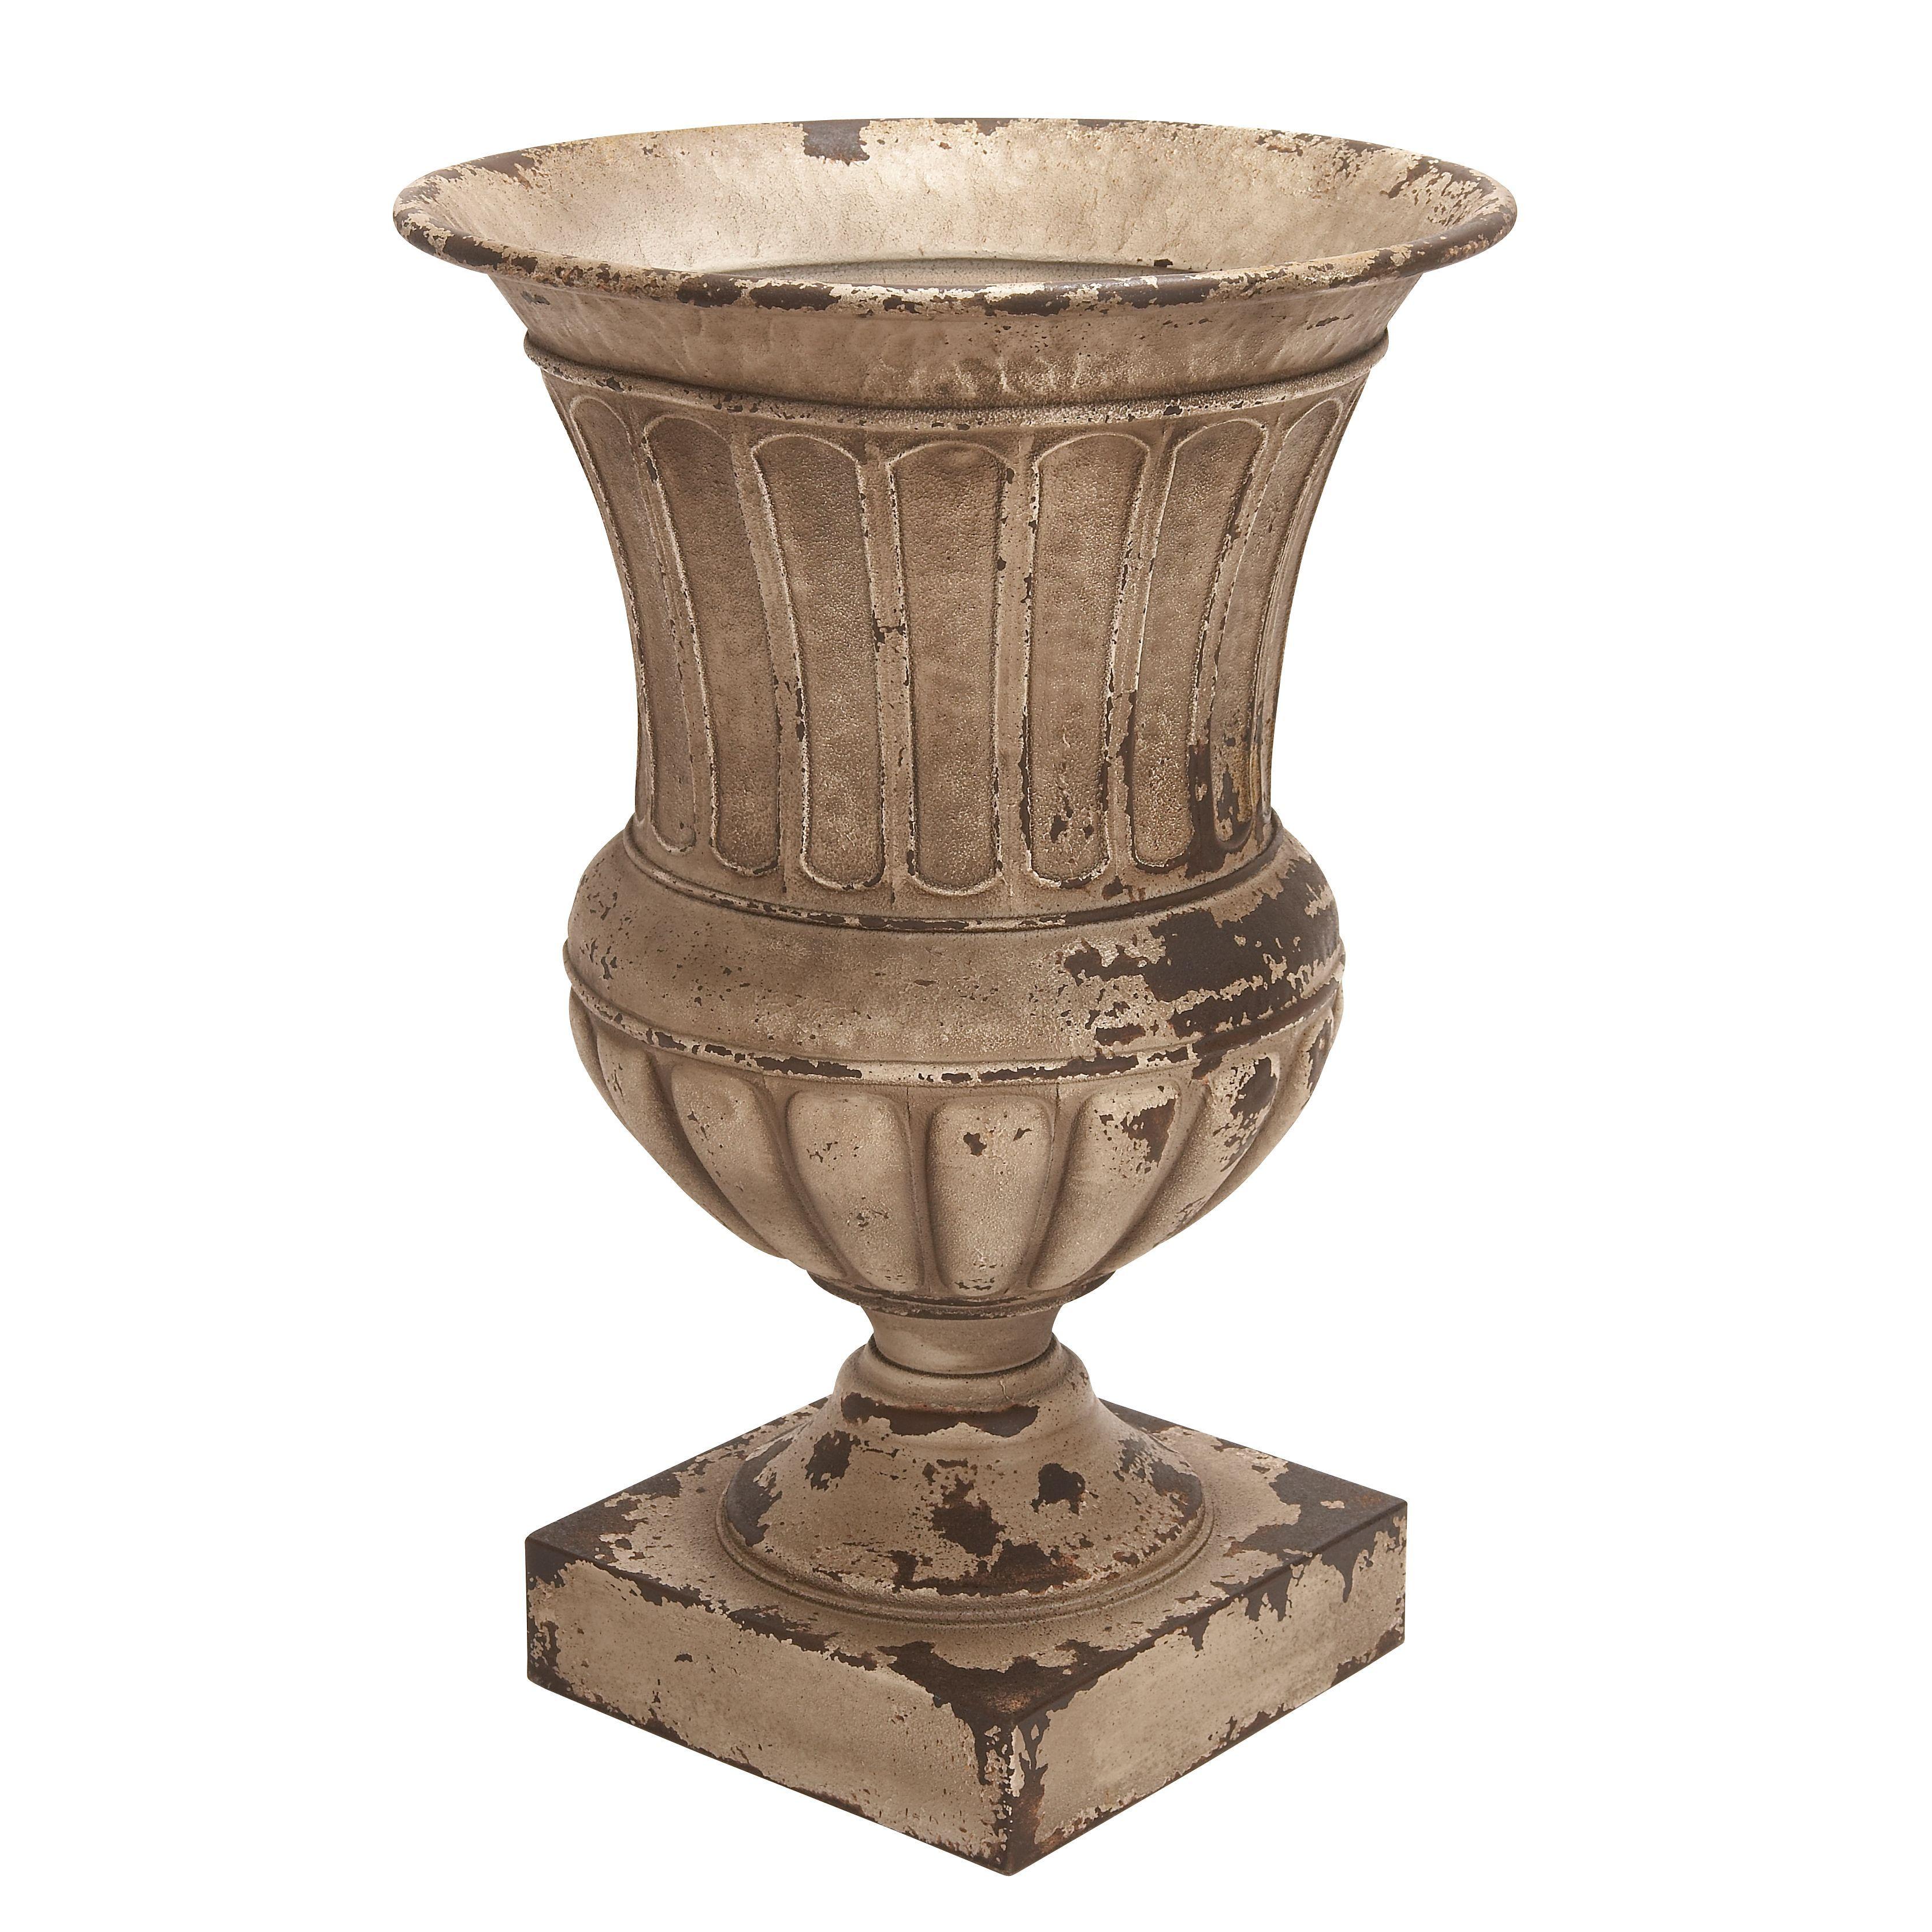 Studio 350 antique metal planter vase metal planter vase black studio 350 antique metal planter vase metal planter vase black acacia 52723 reviewsmspy